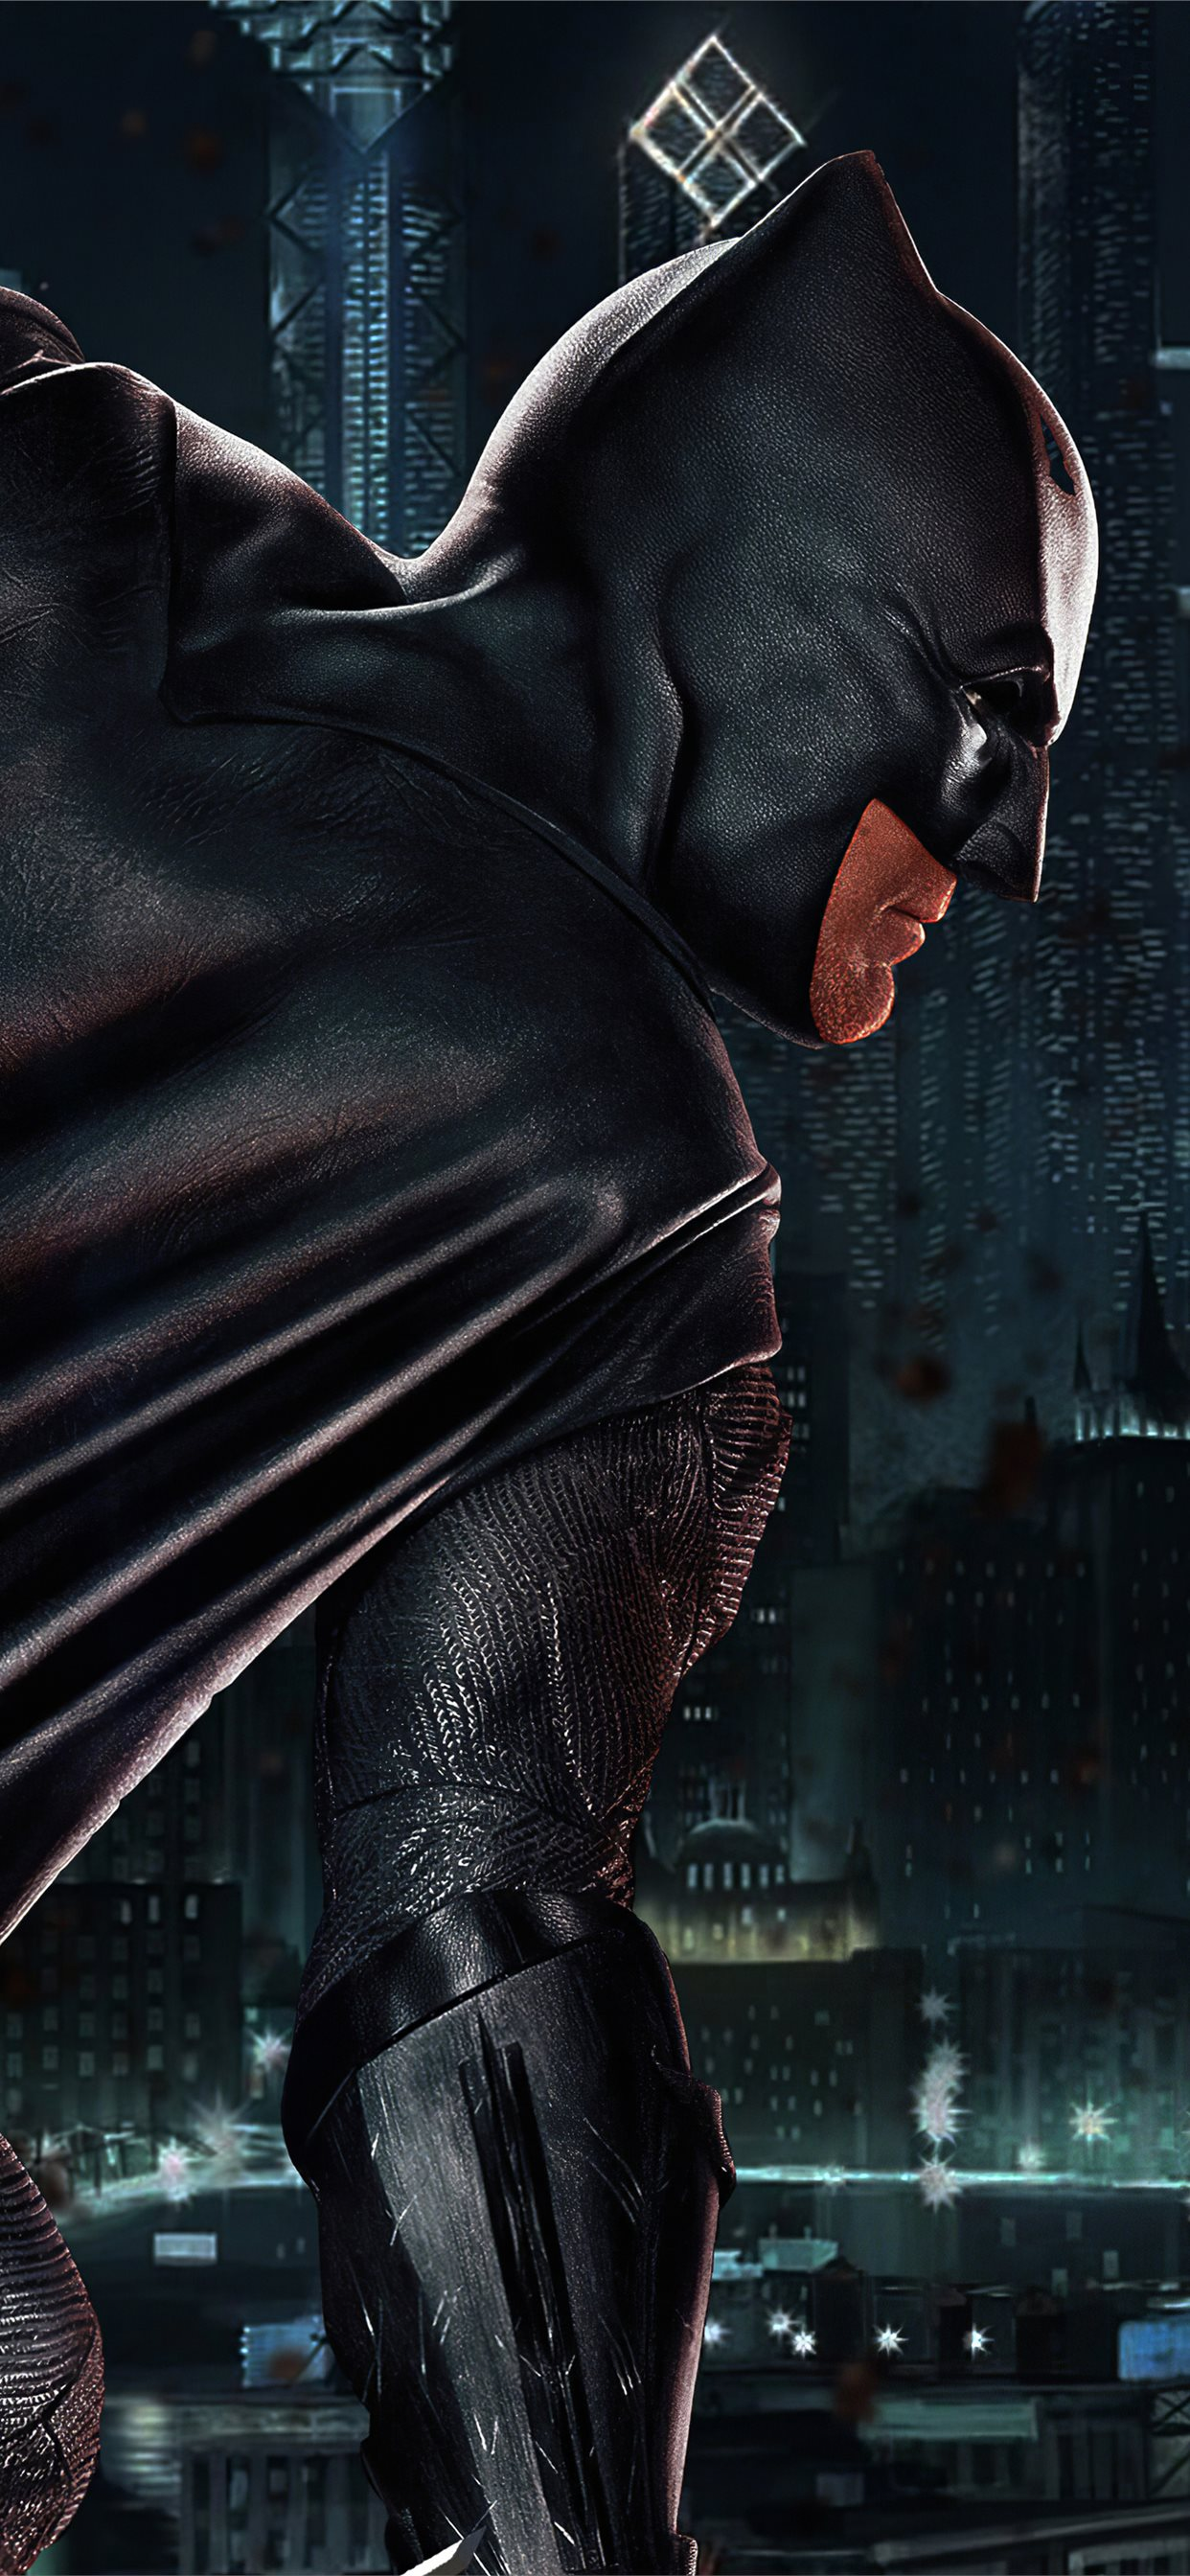 The Batman Deathstroke 4k Iphone Wallpapers Free Download